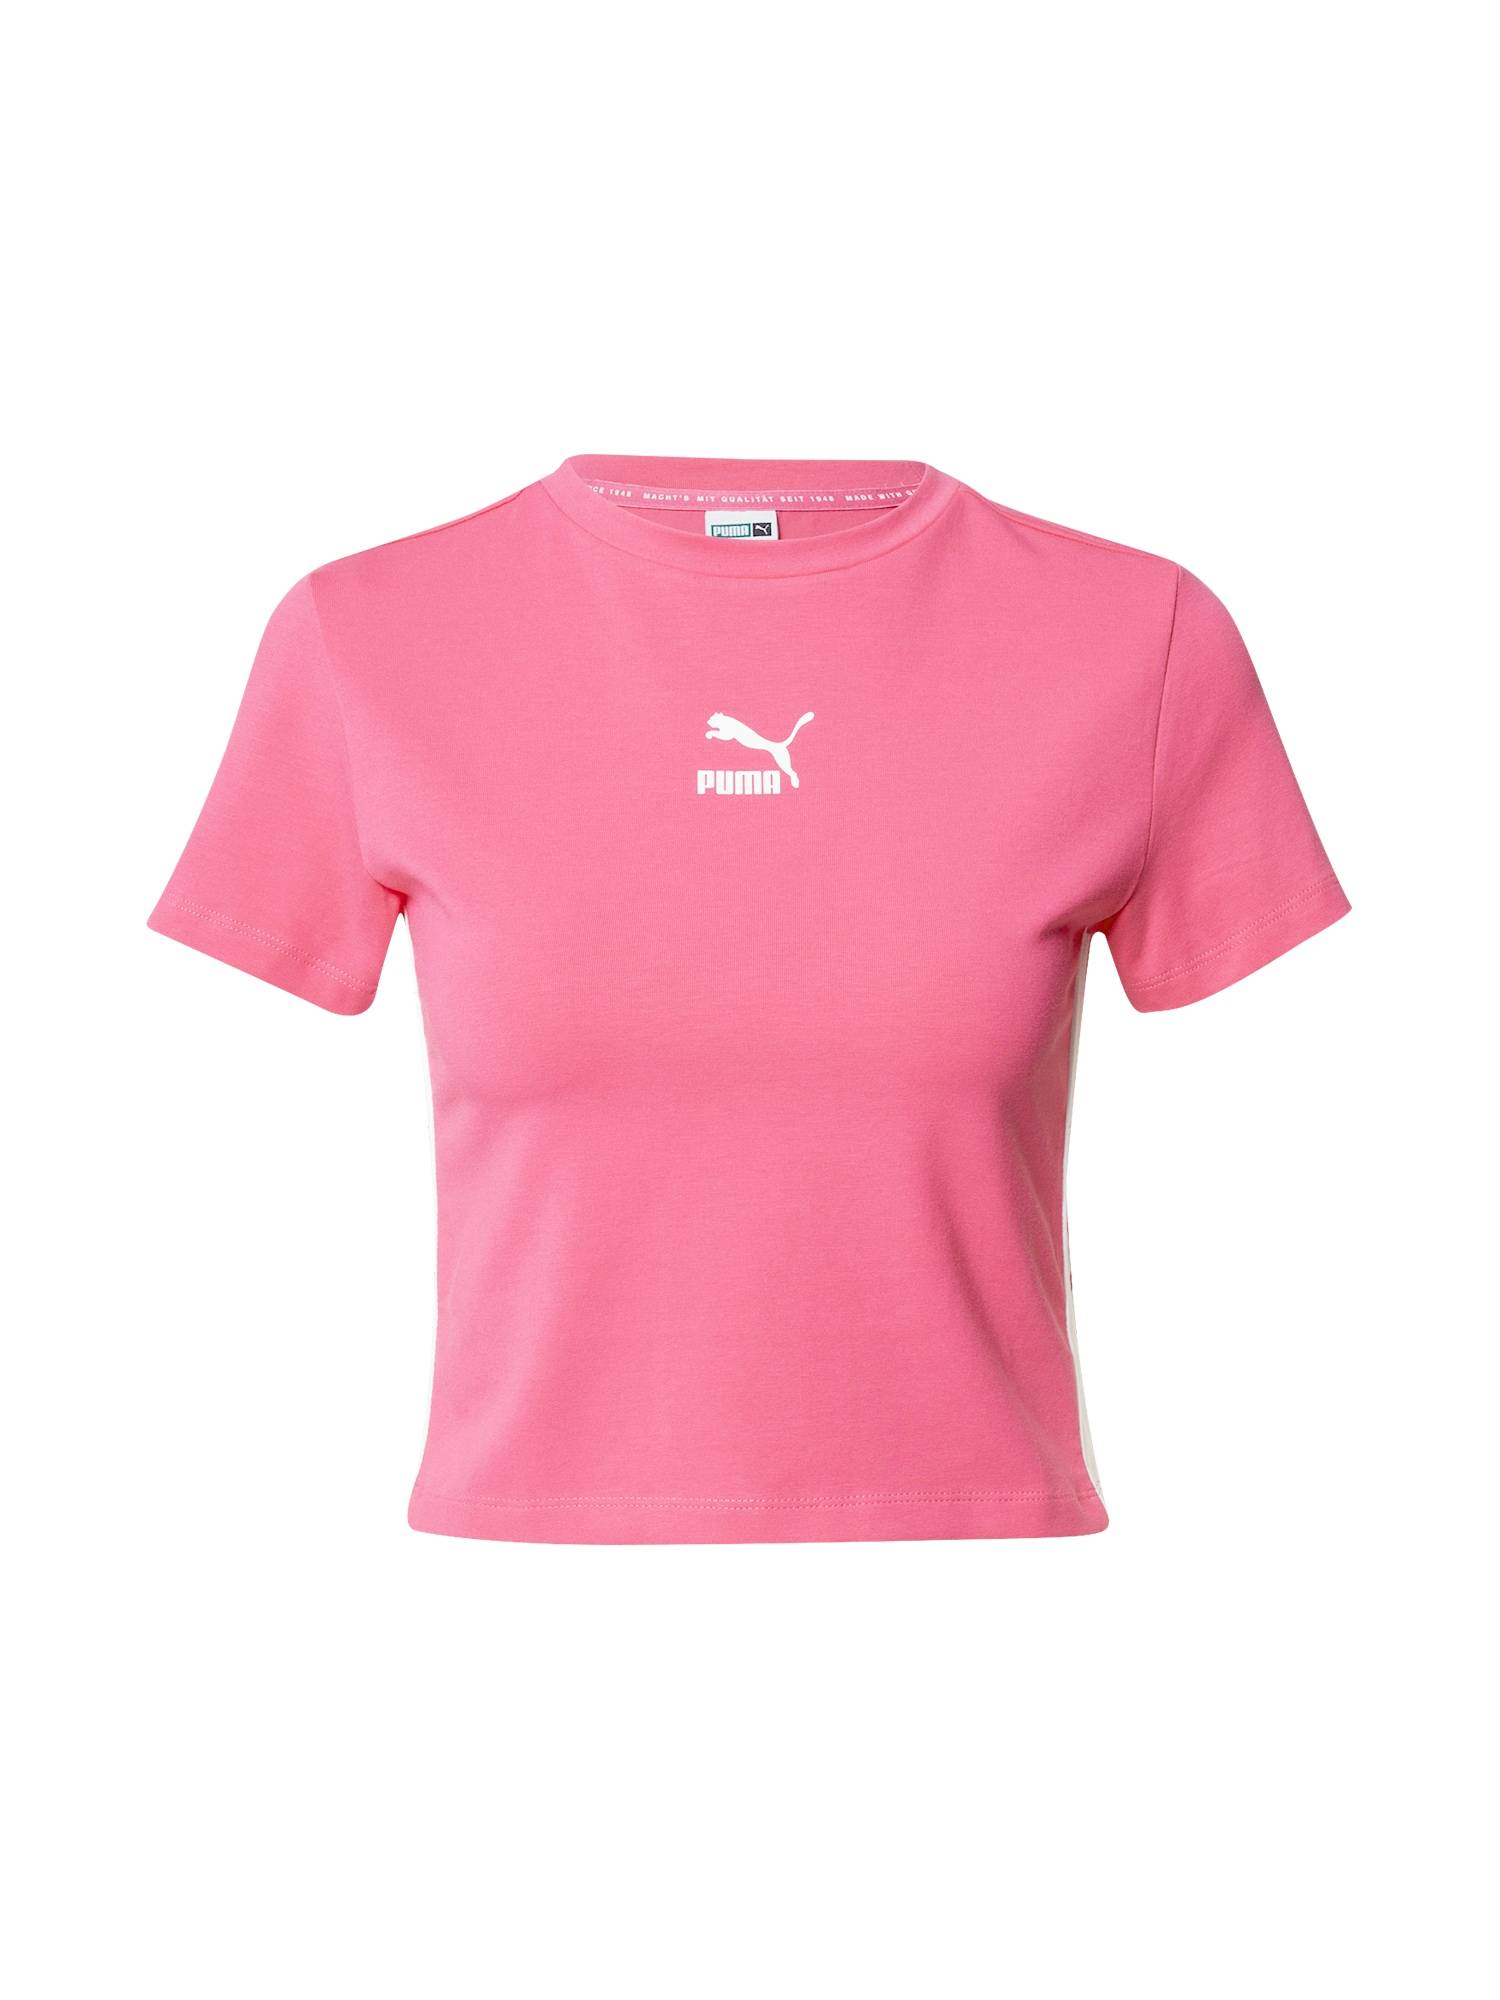 PUMA T-shirt  - Rose - Taille: M - female